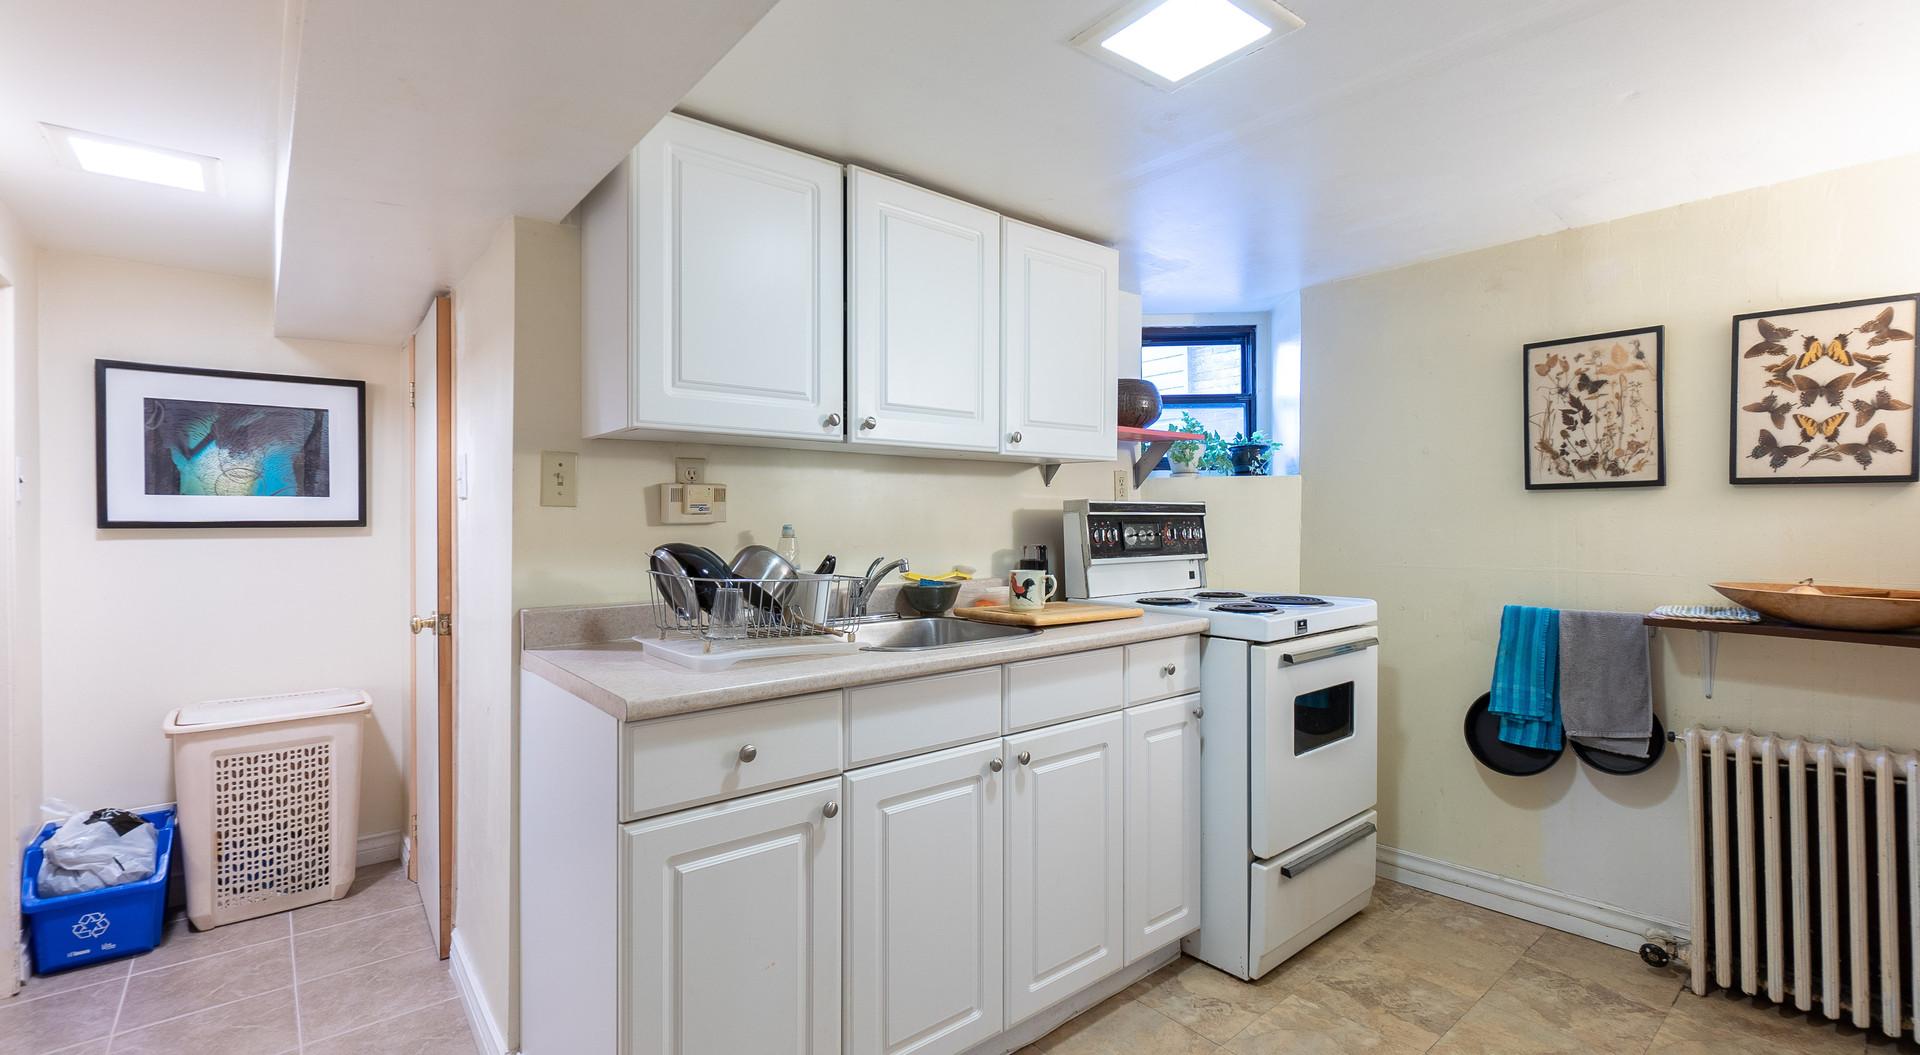 Basement kitchen and hallway.jpg